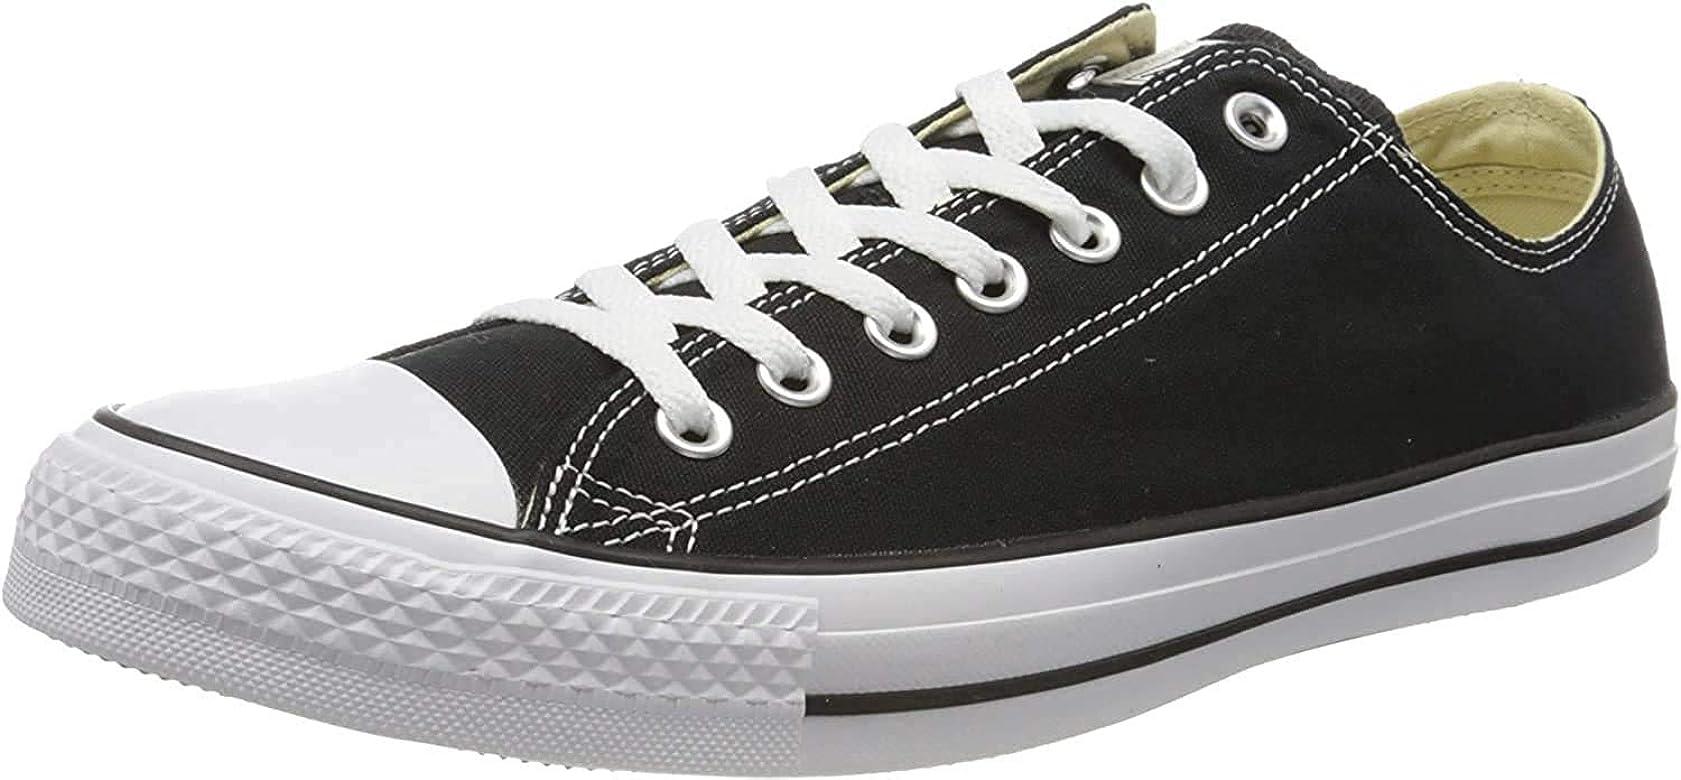 US Women // 9.5 D US Men, Black//Black M 43 M EU // 11.5 B M Converse Chuck Taylor All Star Core Canvas Low Top Sneaker